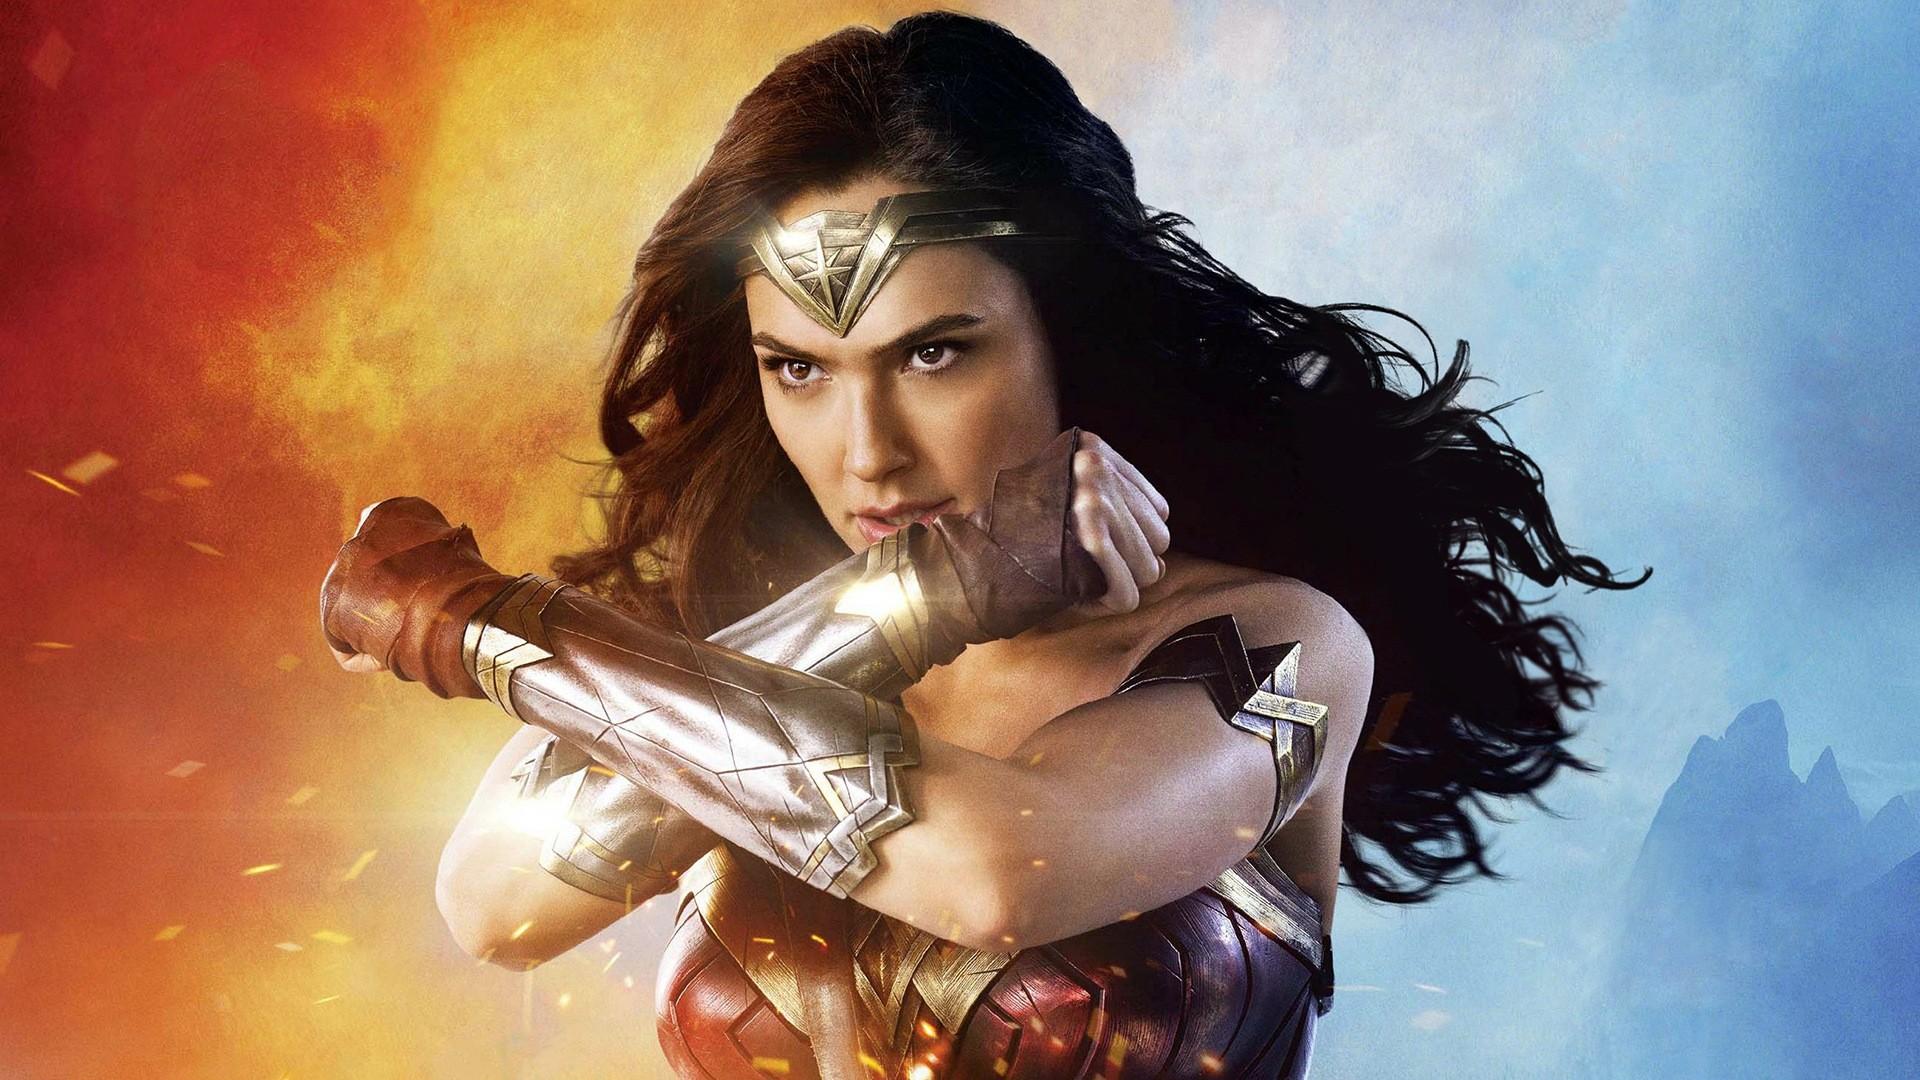 Wonderwoman Wallpaper 69 Images